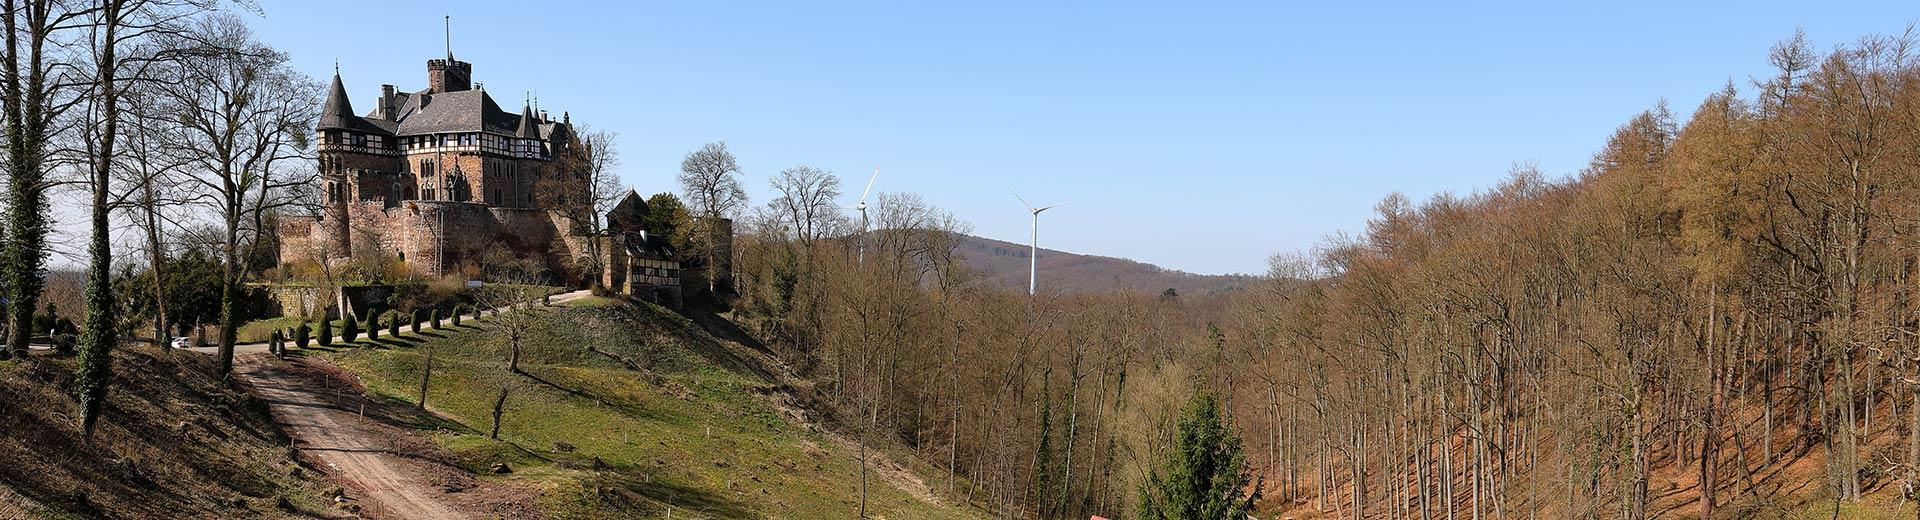 Ausflugsziele Nordhessen